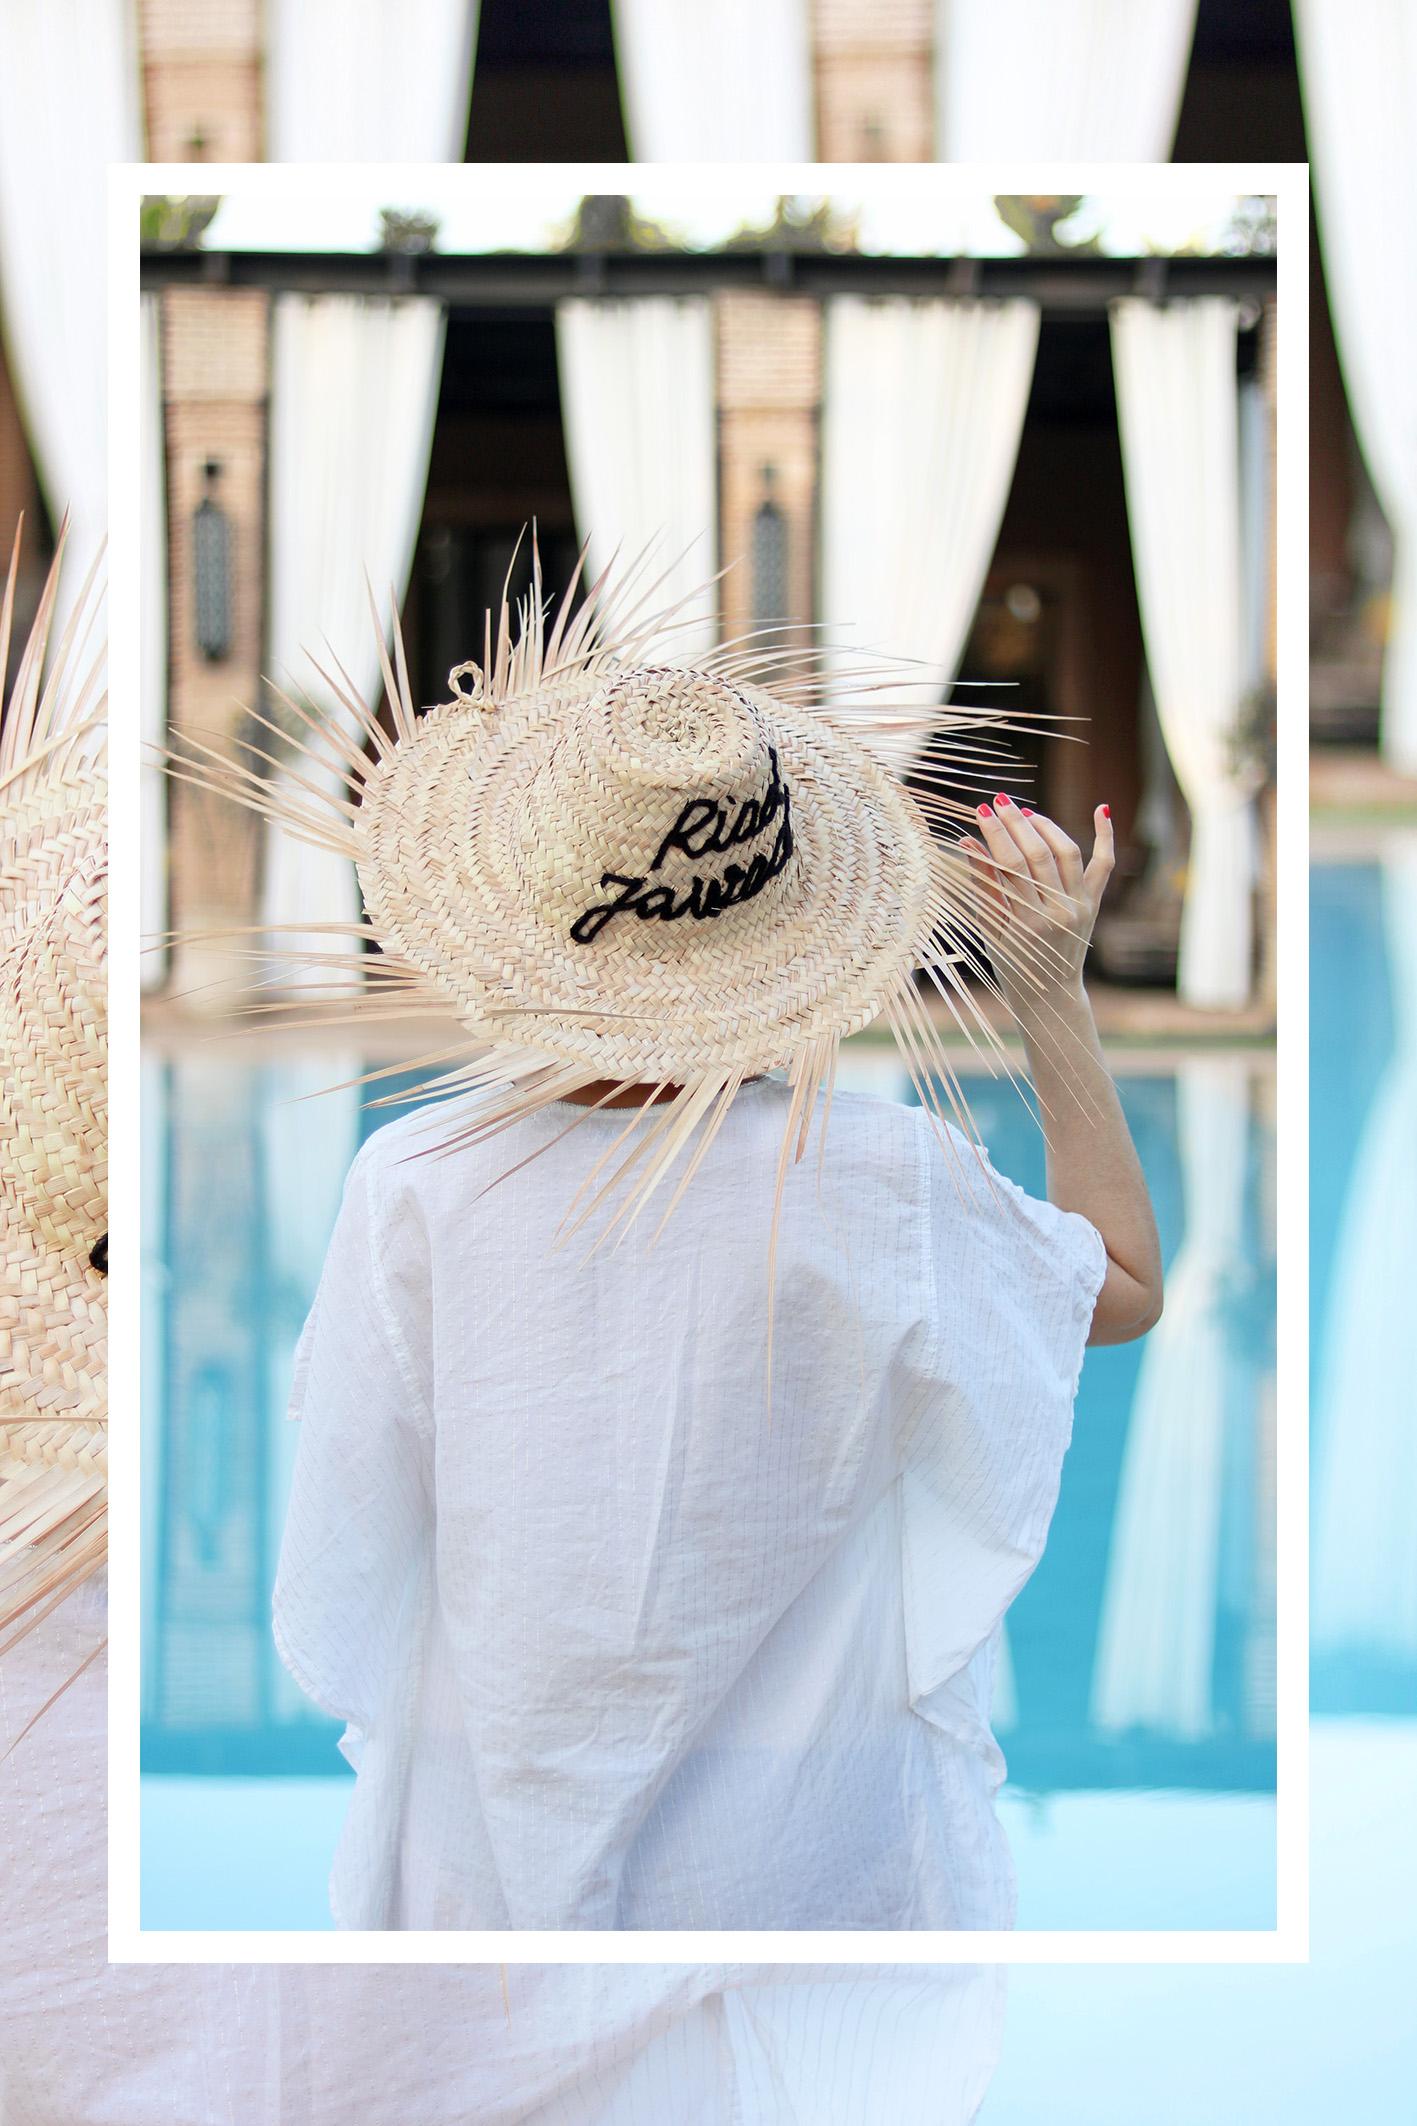 hotel-piscine-riad-jawad-marrackech